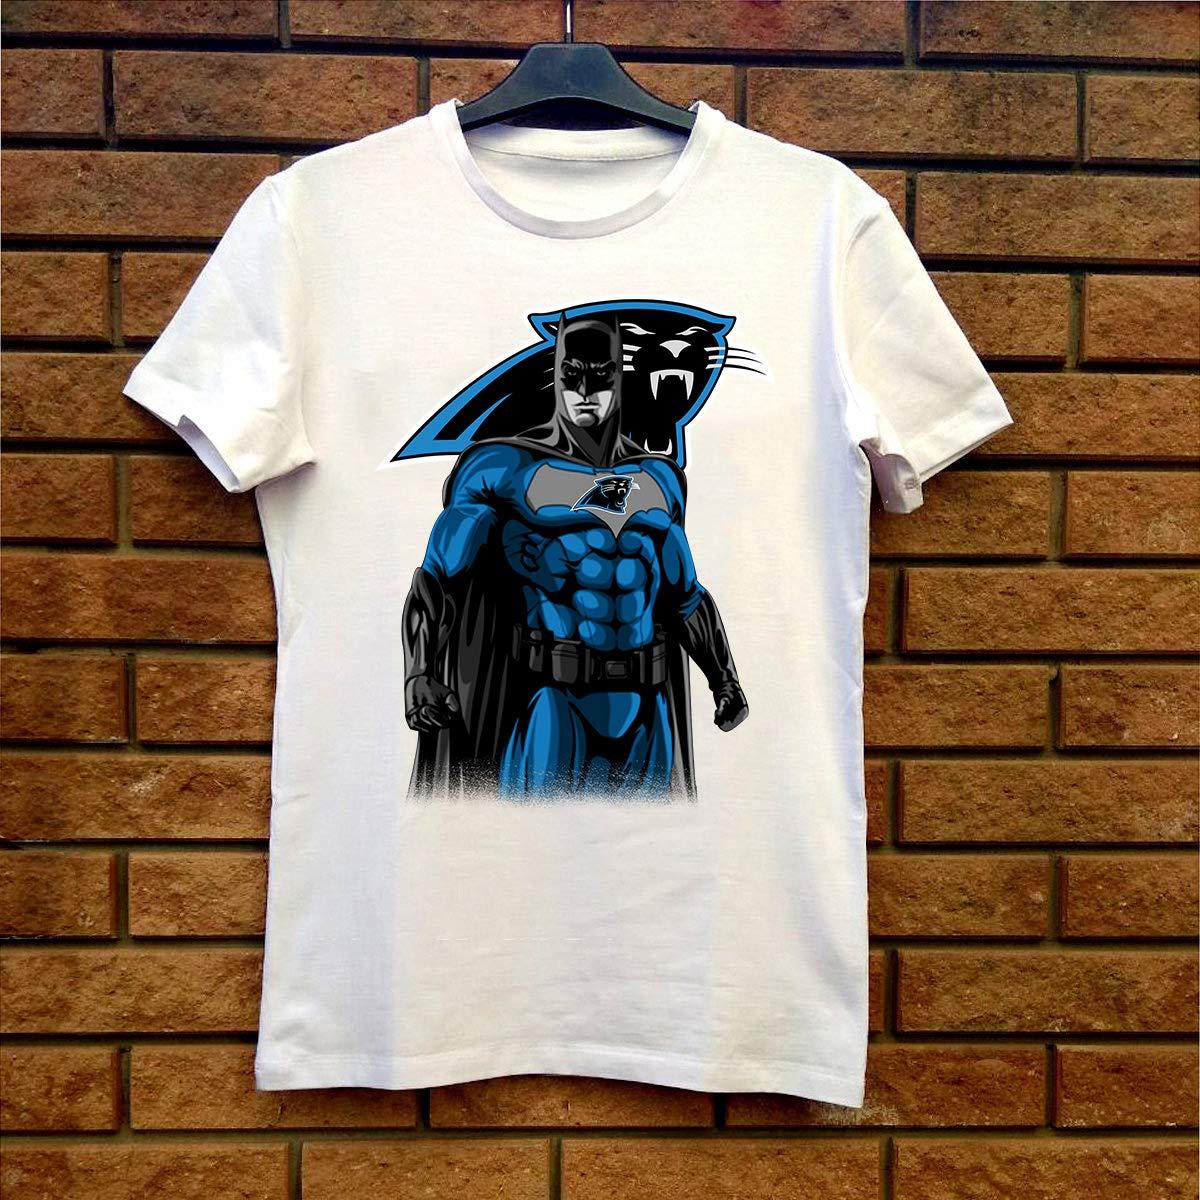 finest selection 5d1a5 0a733 Amazon.com: Batman Superhero Carolina-Panthers Fan Gift T ...